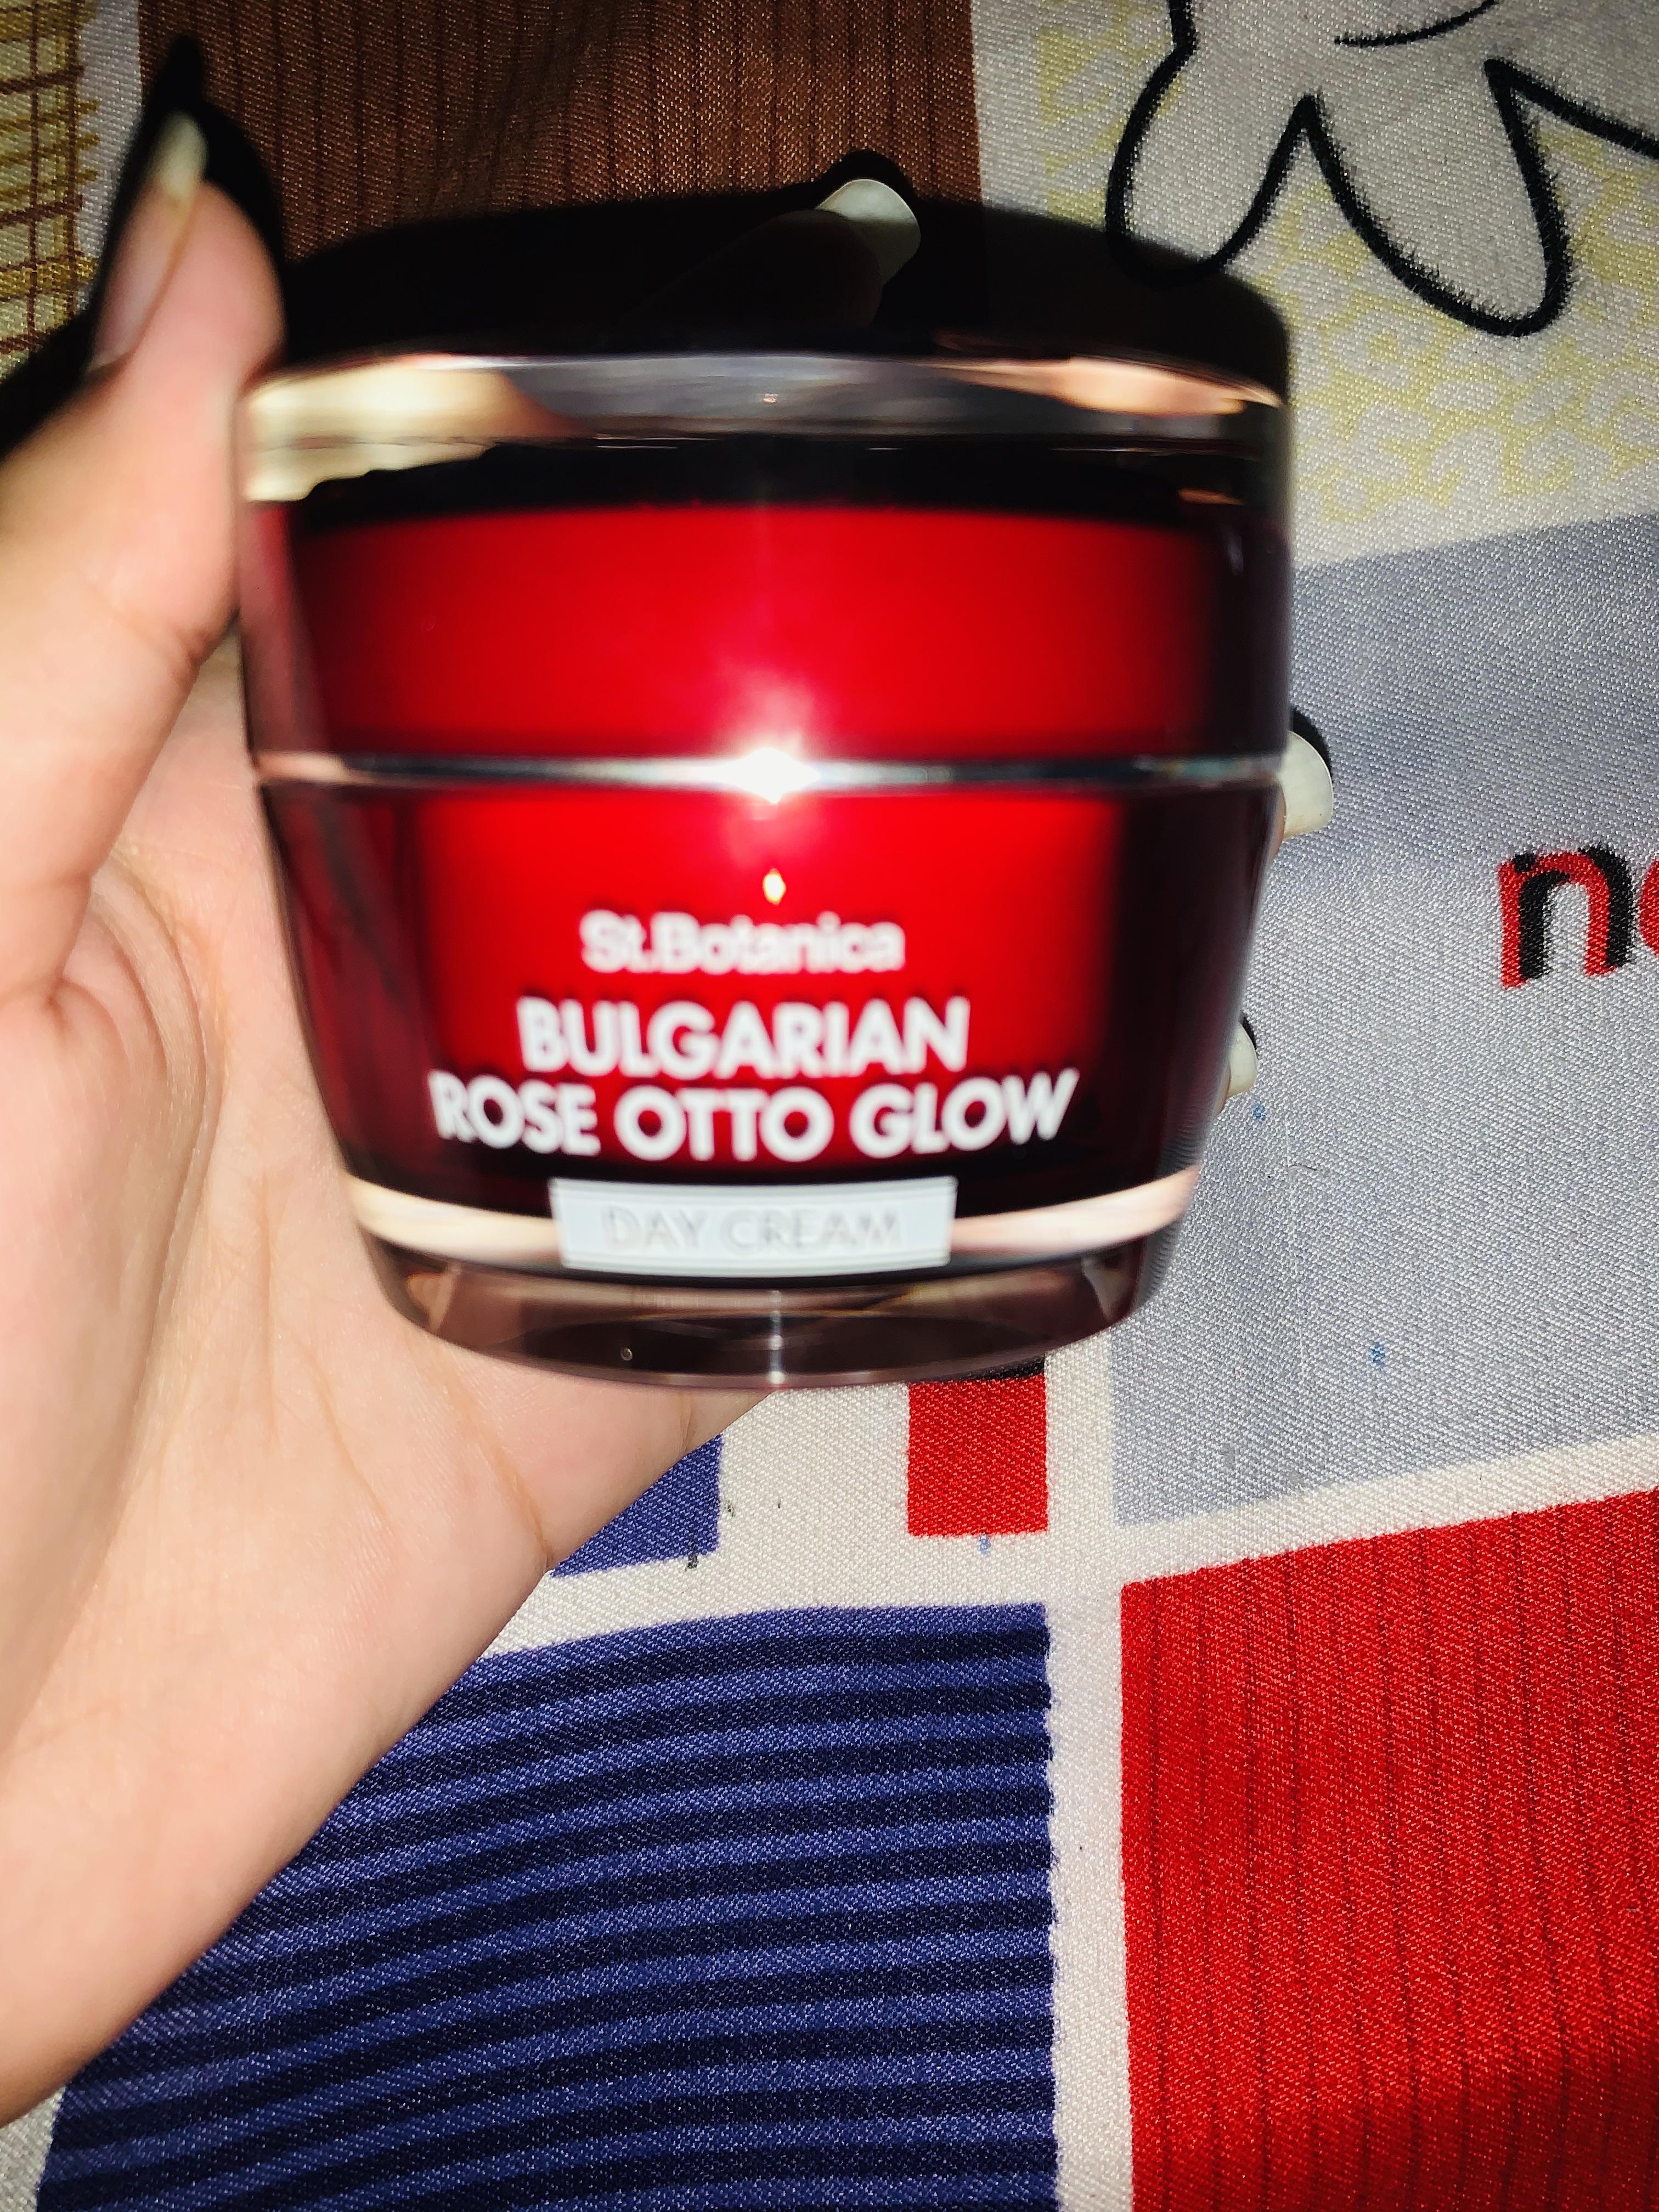 St.Botanica Bulgarian Rose Otto Glow Night Cream -Amazing product!!-By singhjhanvi